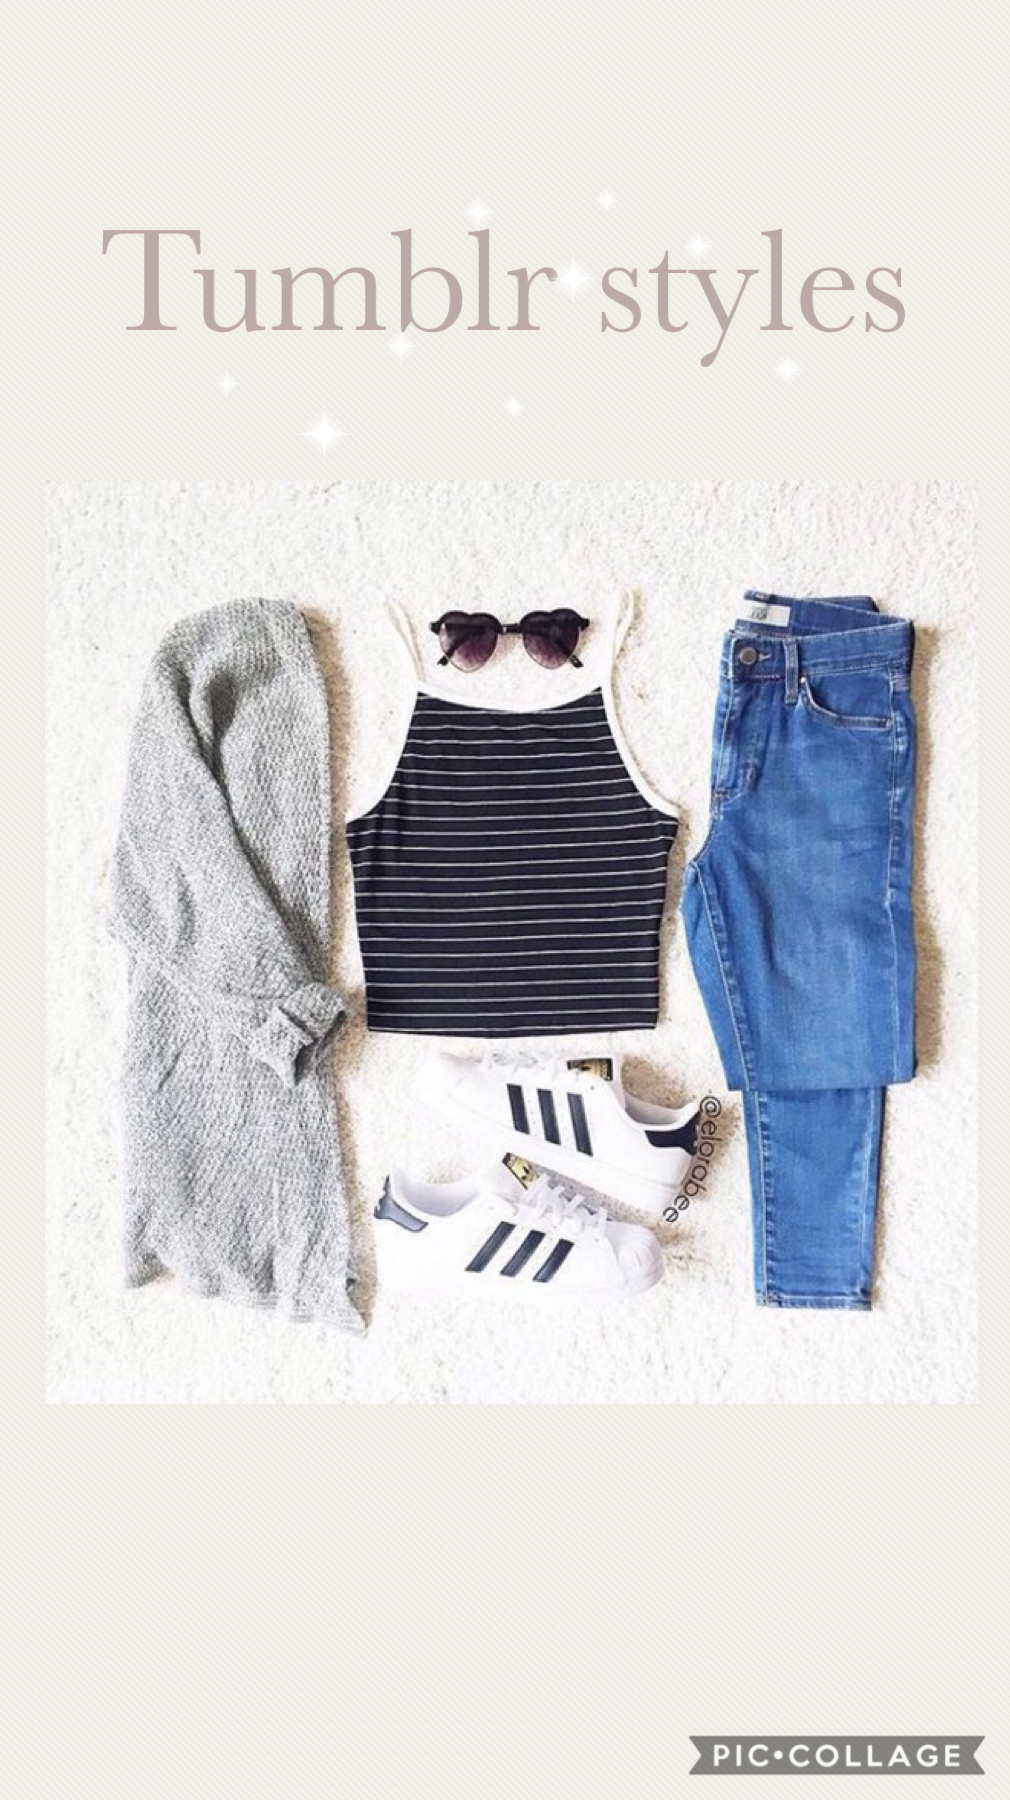 Tumblr styles #3